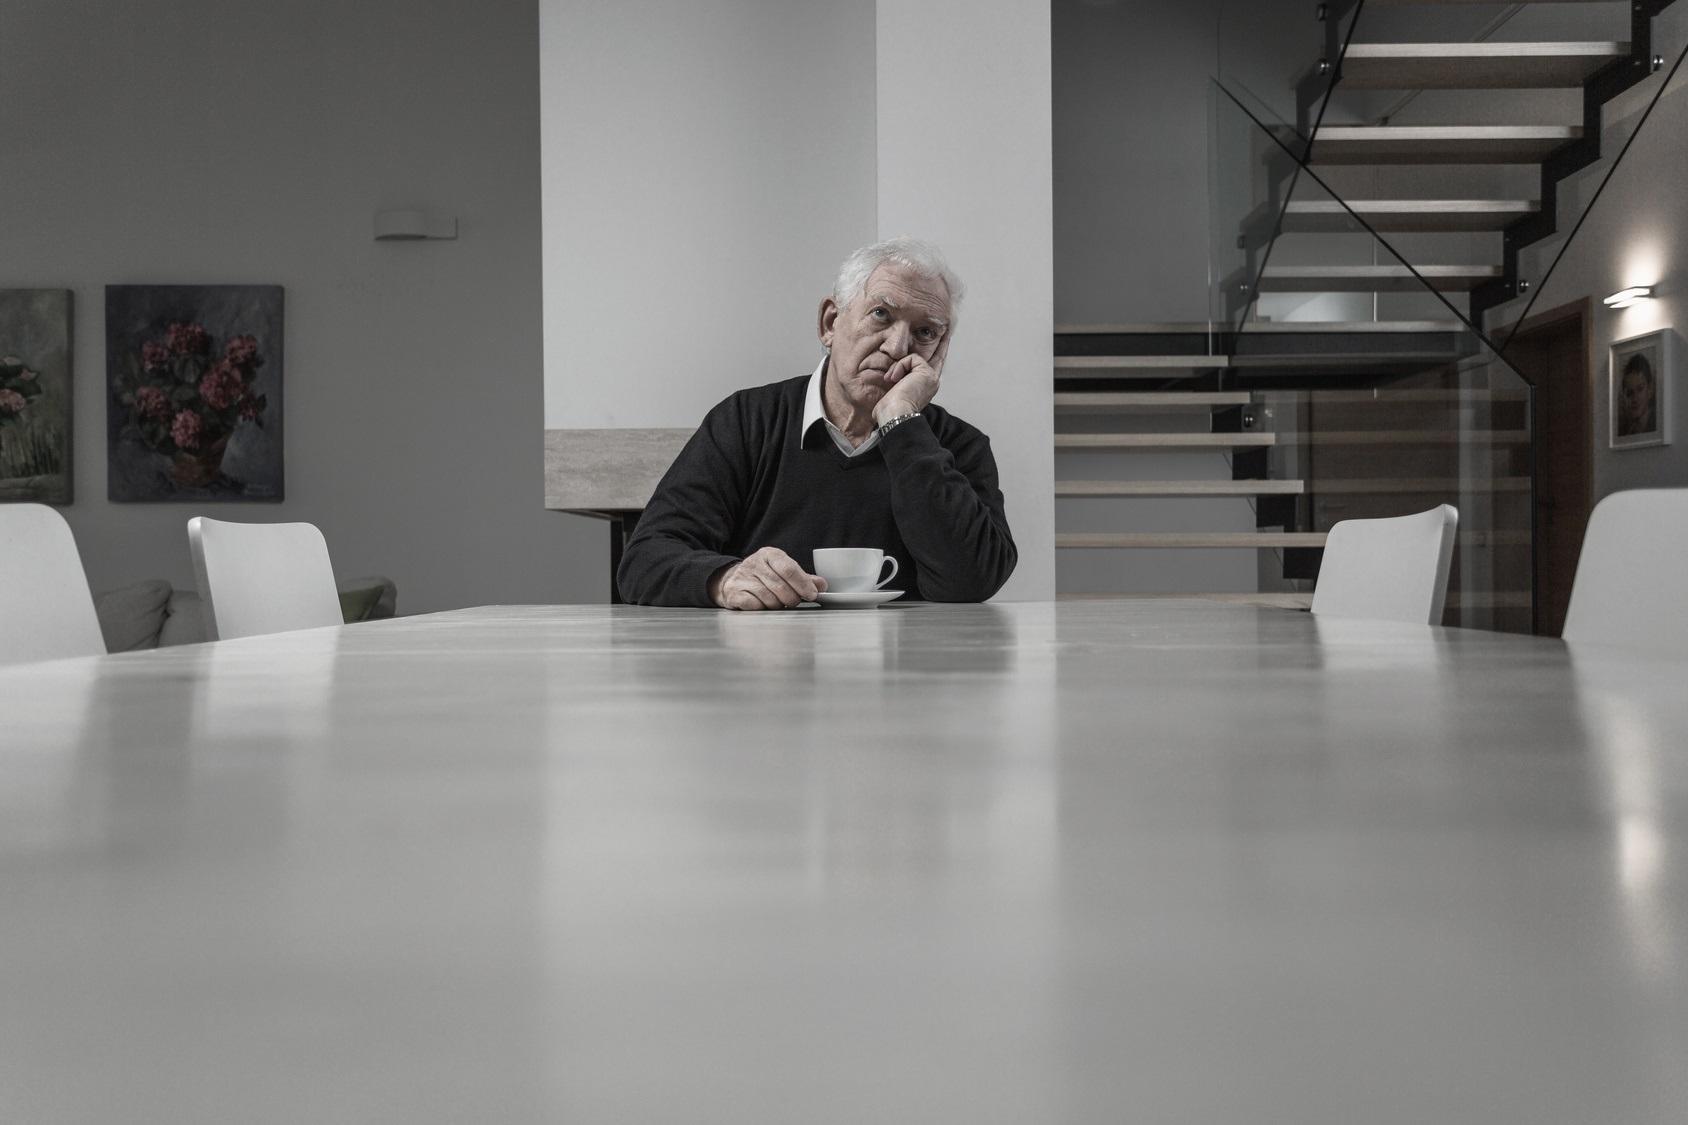 Abuelo soledad